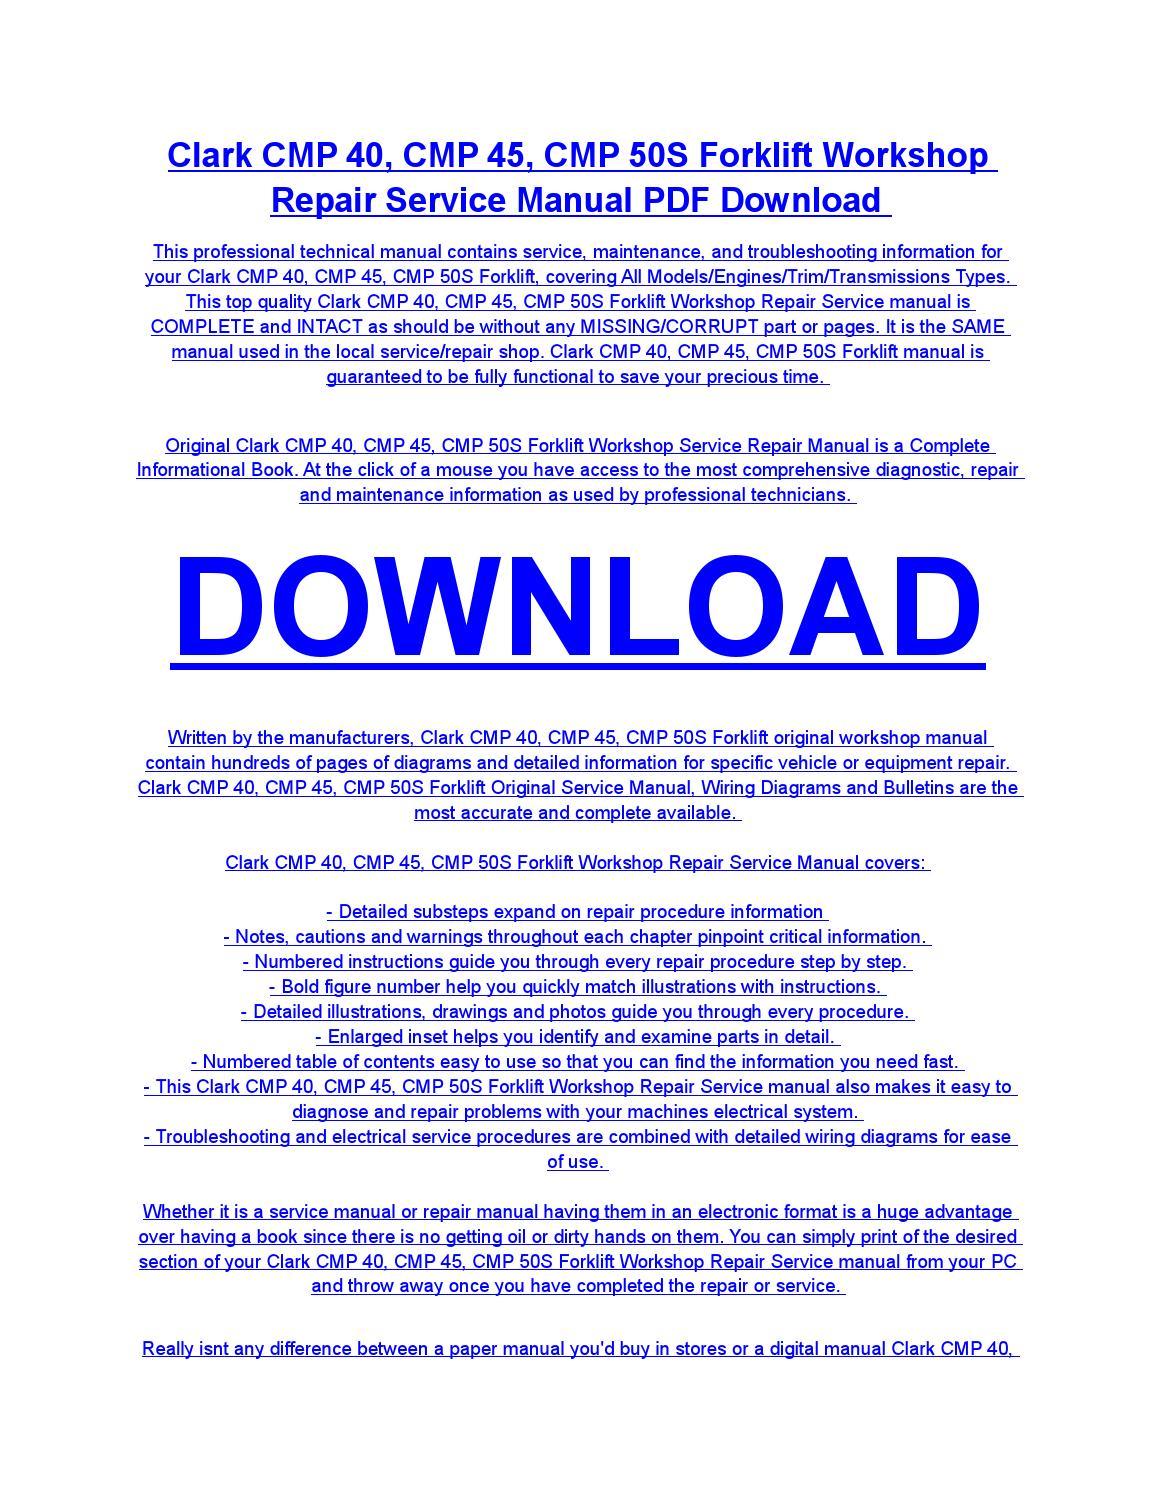 clark cmp 40 cmp 45 cmp 50s forklift service repair workshop rh issuu com